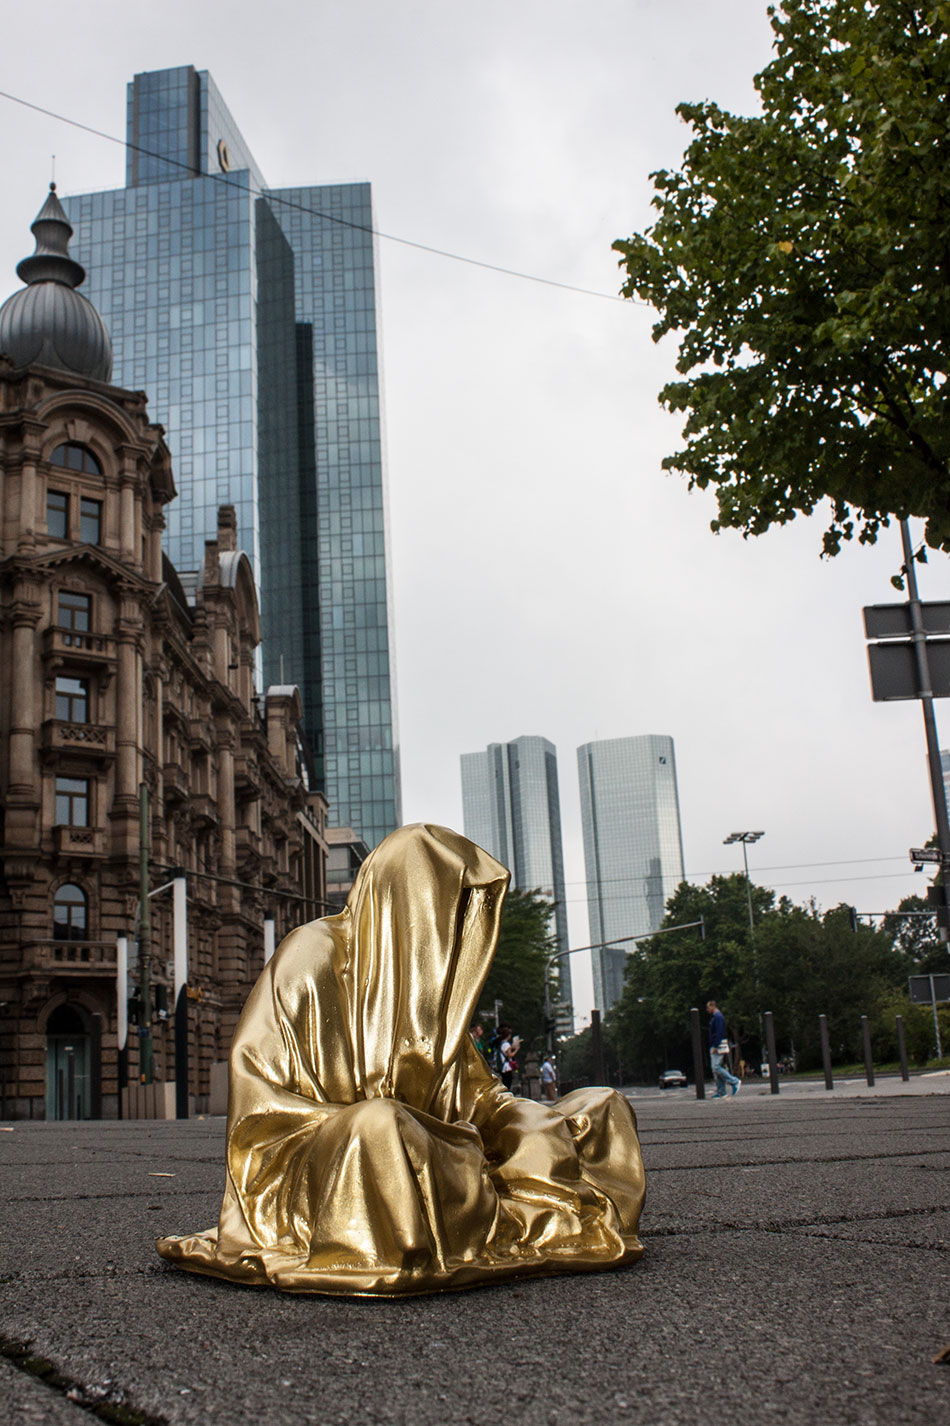 art-germany-frankfurt-guardians-of-time-manfred-kielnhofer-public-modern-contemporary-art-fine-arts-sculpture-design-streat-art-2189